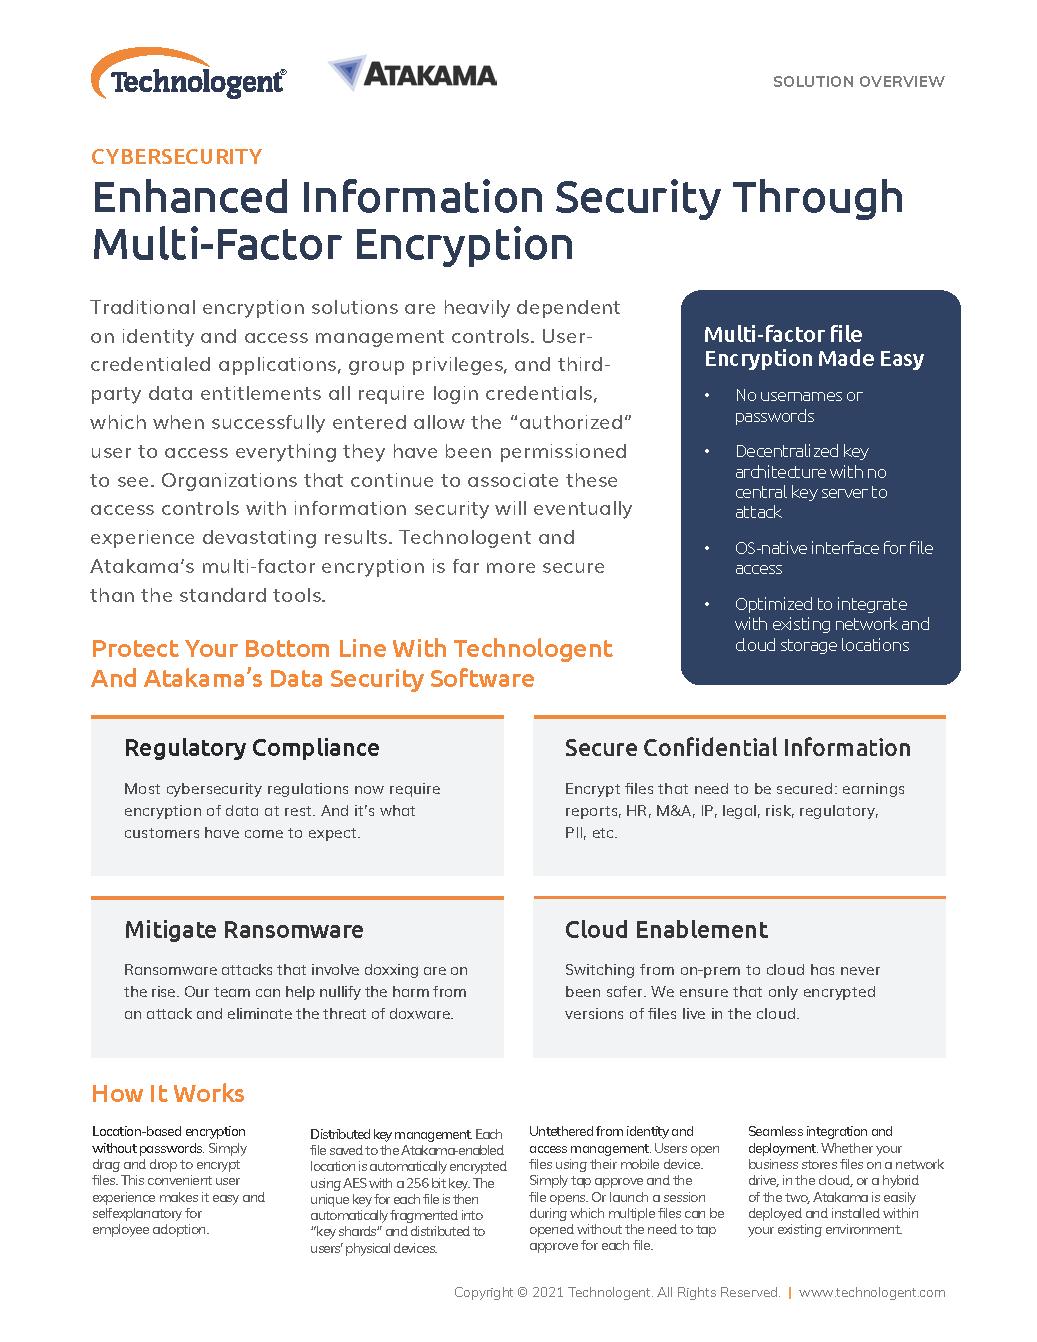 Technologent - Atakama Enhanced Information Security Through Multi-Factor Encryption 2021